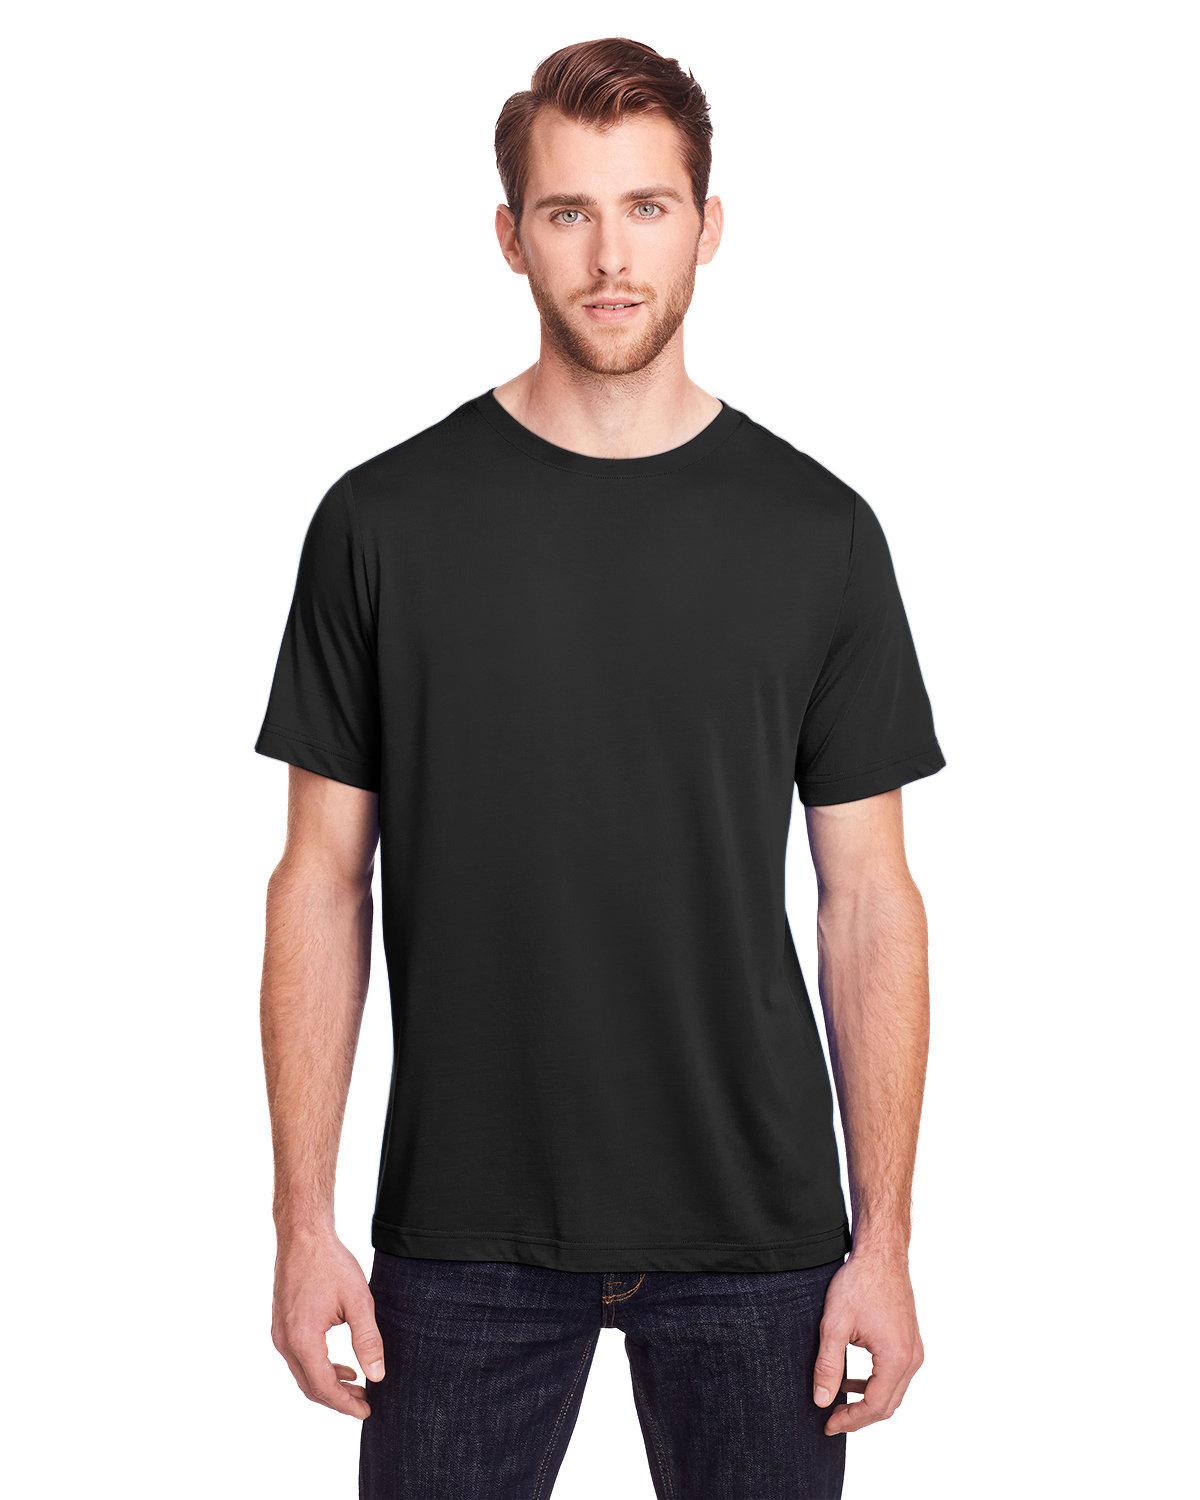 Core 365 Adult Fusion ChromaSoft Performance T-Shirt BLACK